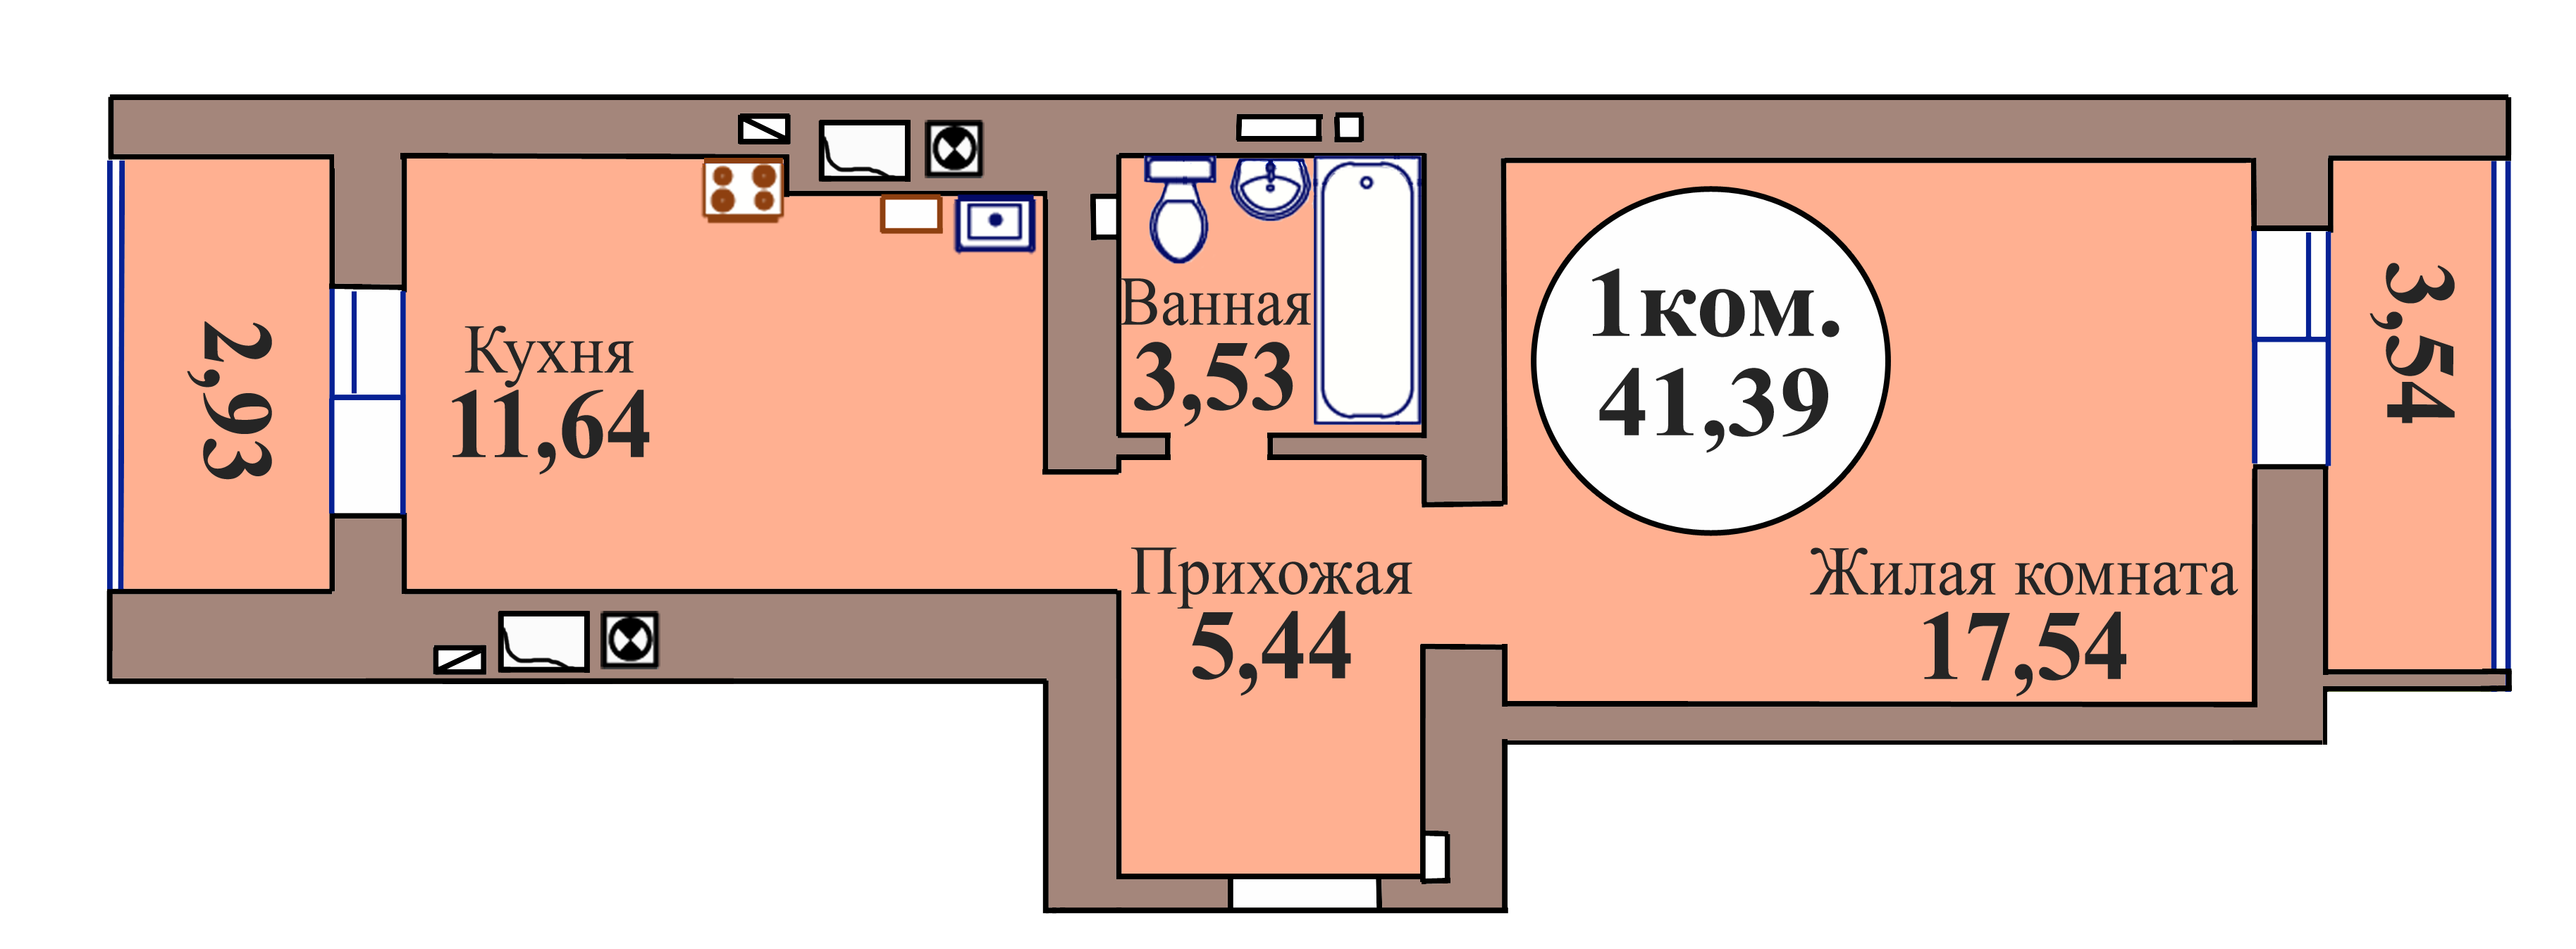 1-комн. кв. по пер. Калининградский, 5 кв. 31 в Калининграде